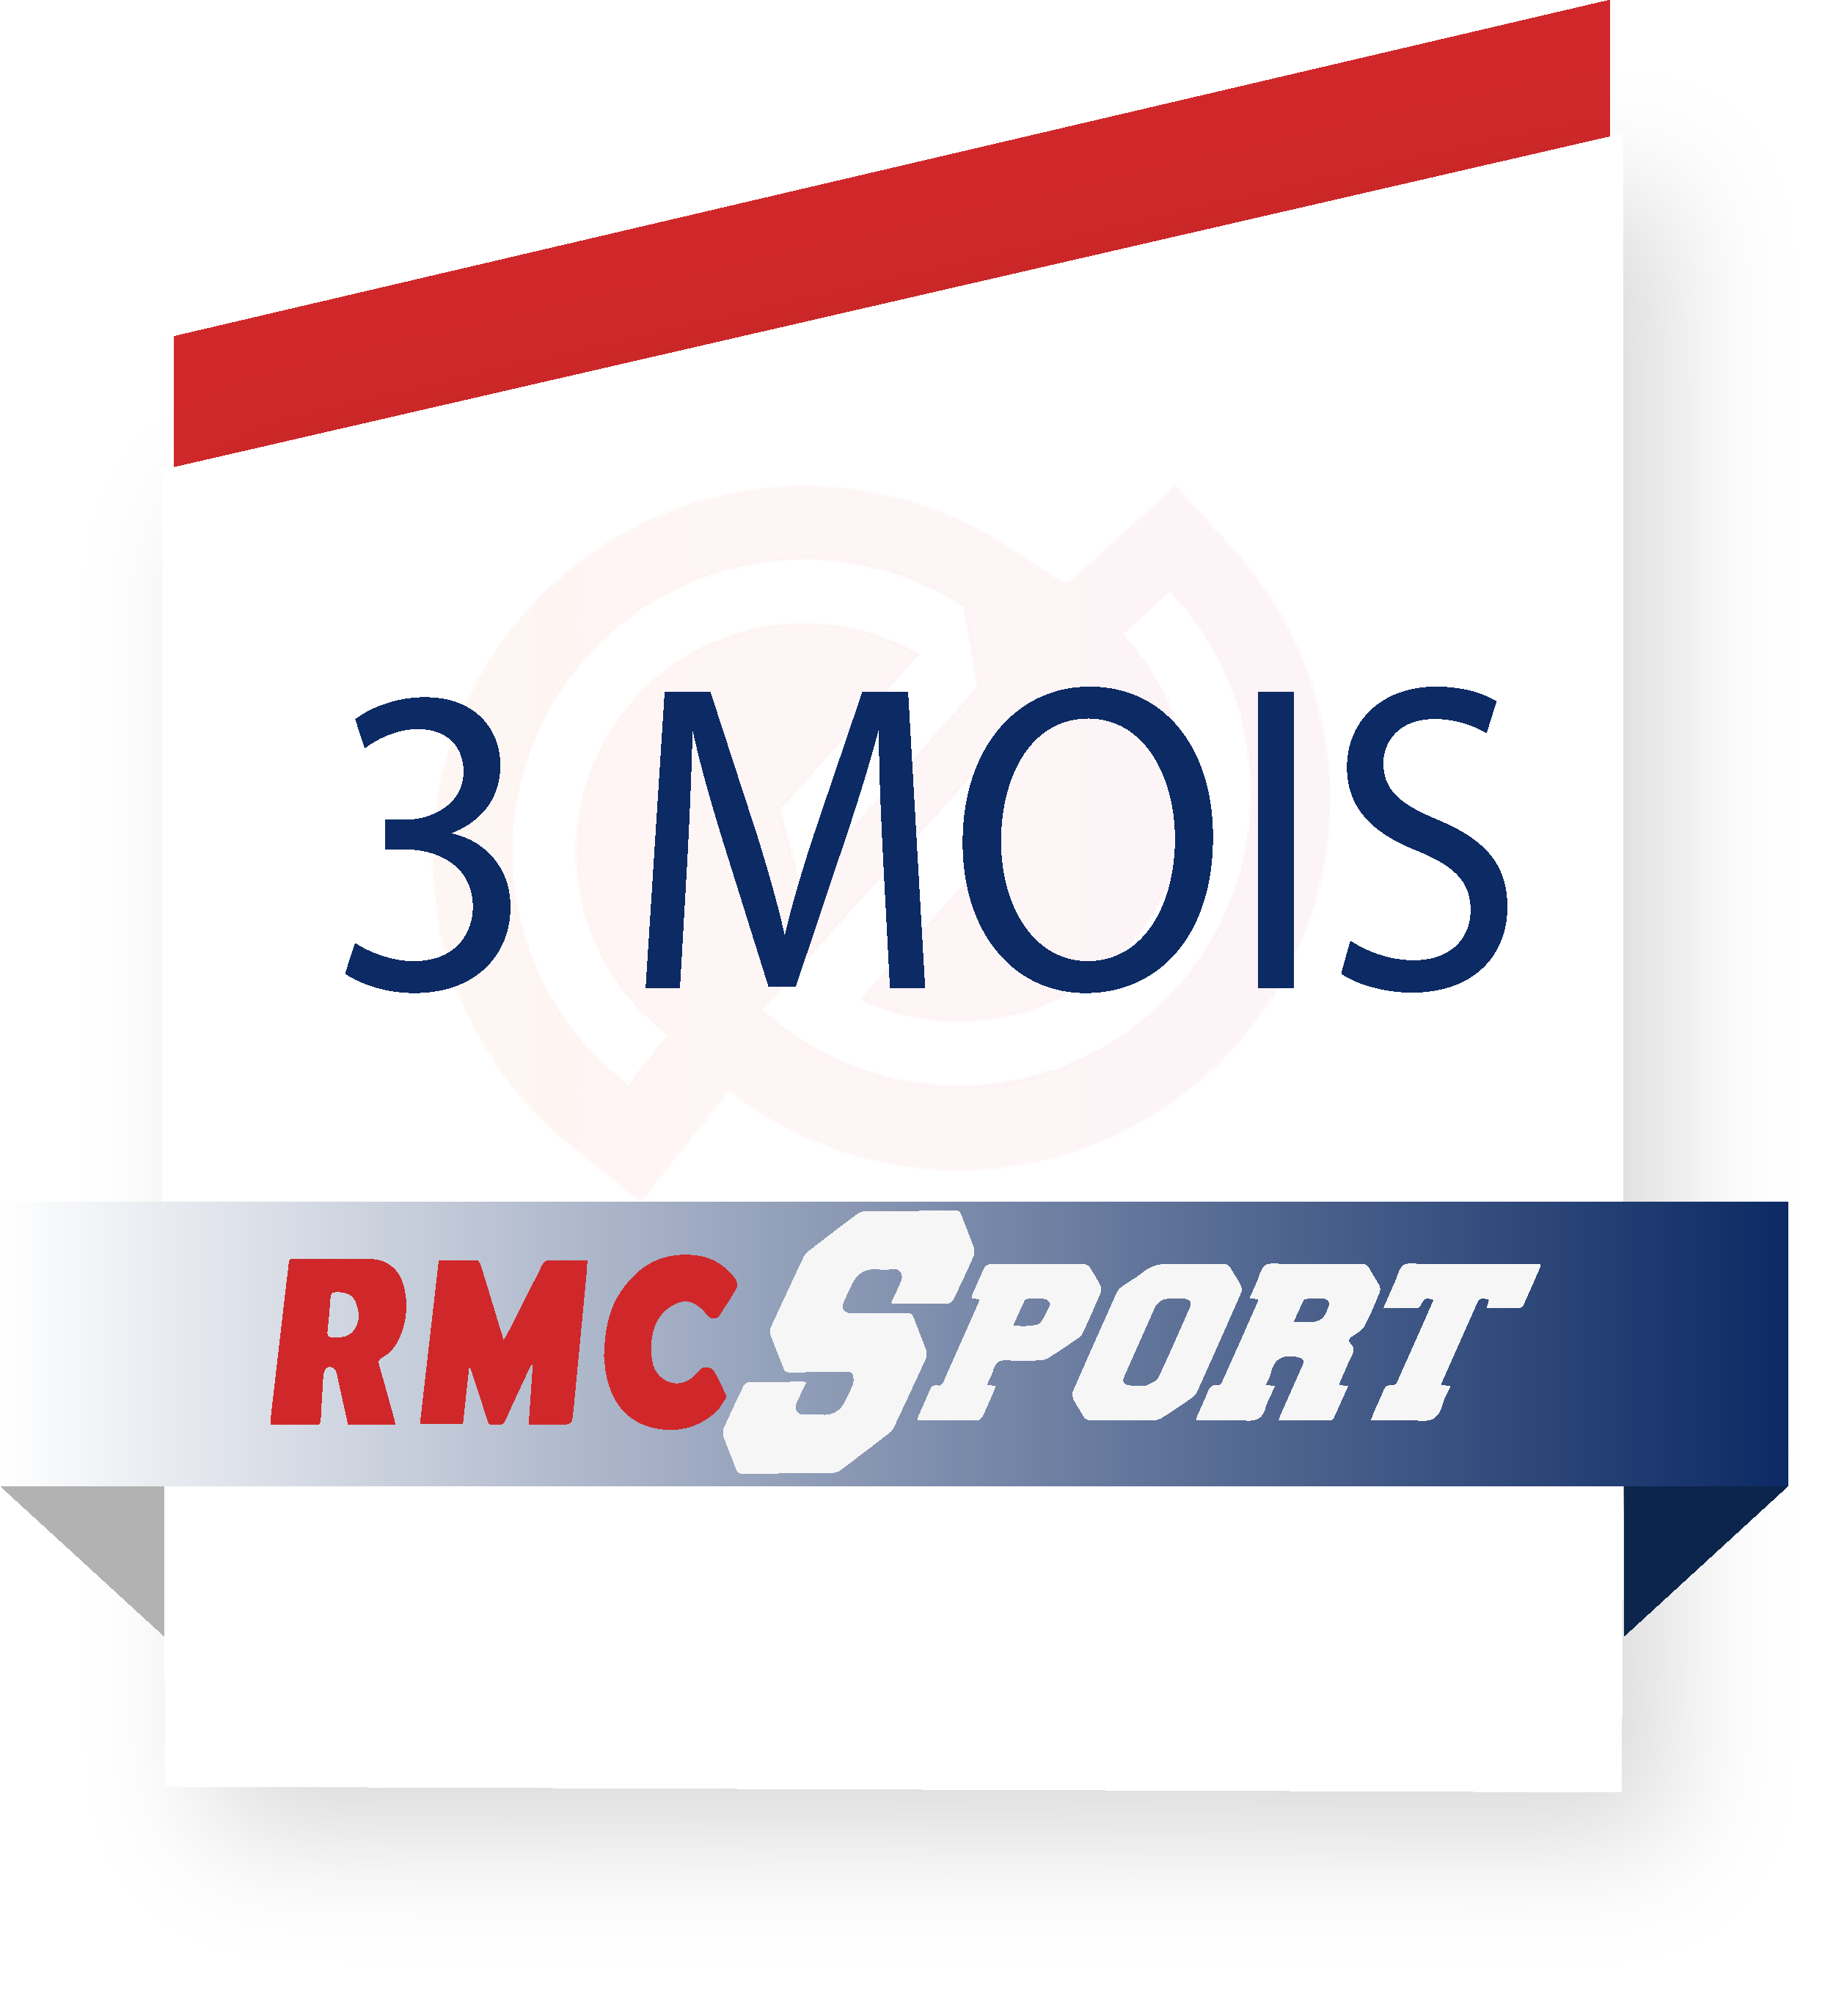 rmc-sport-3-mois